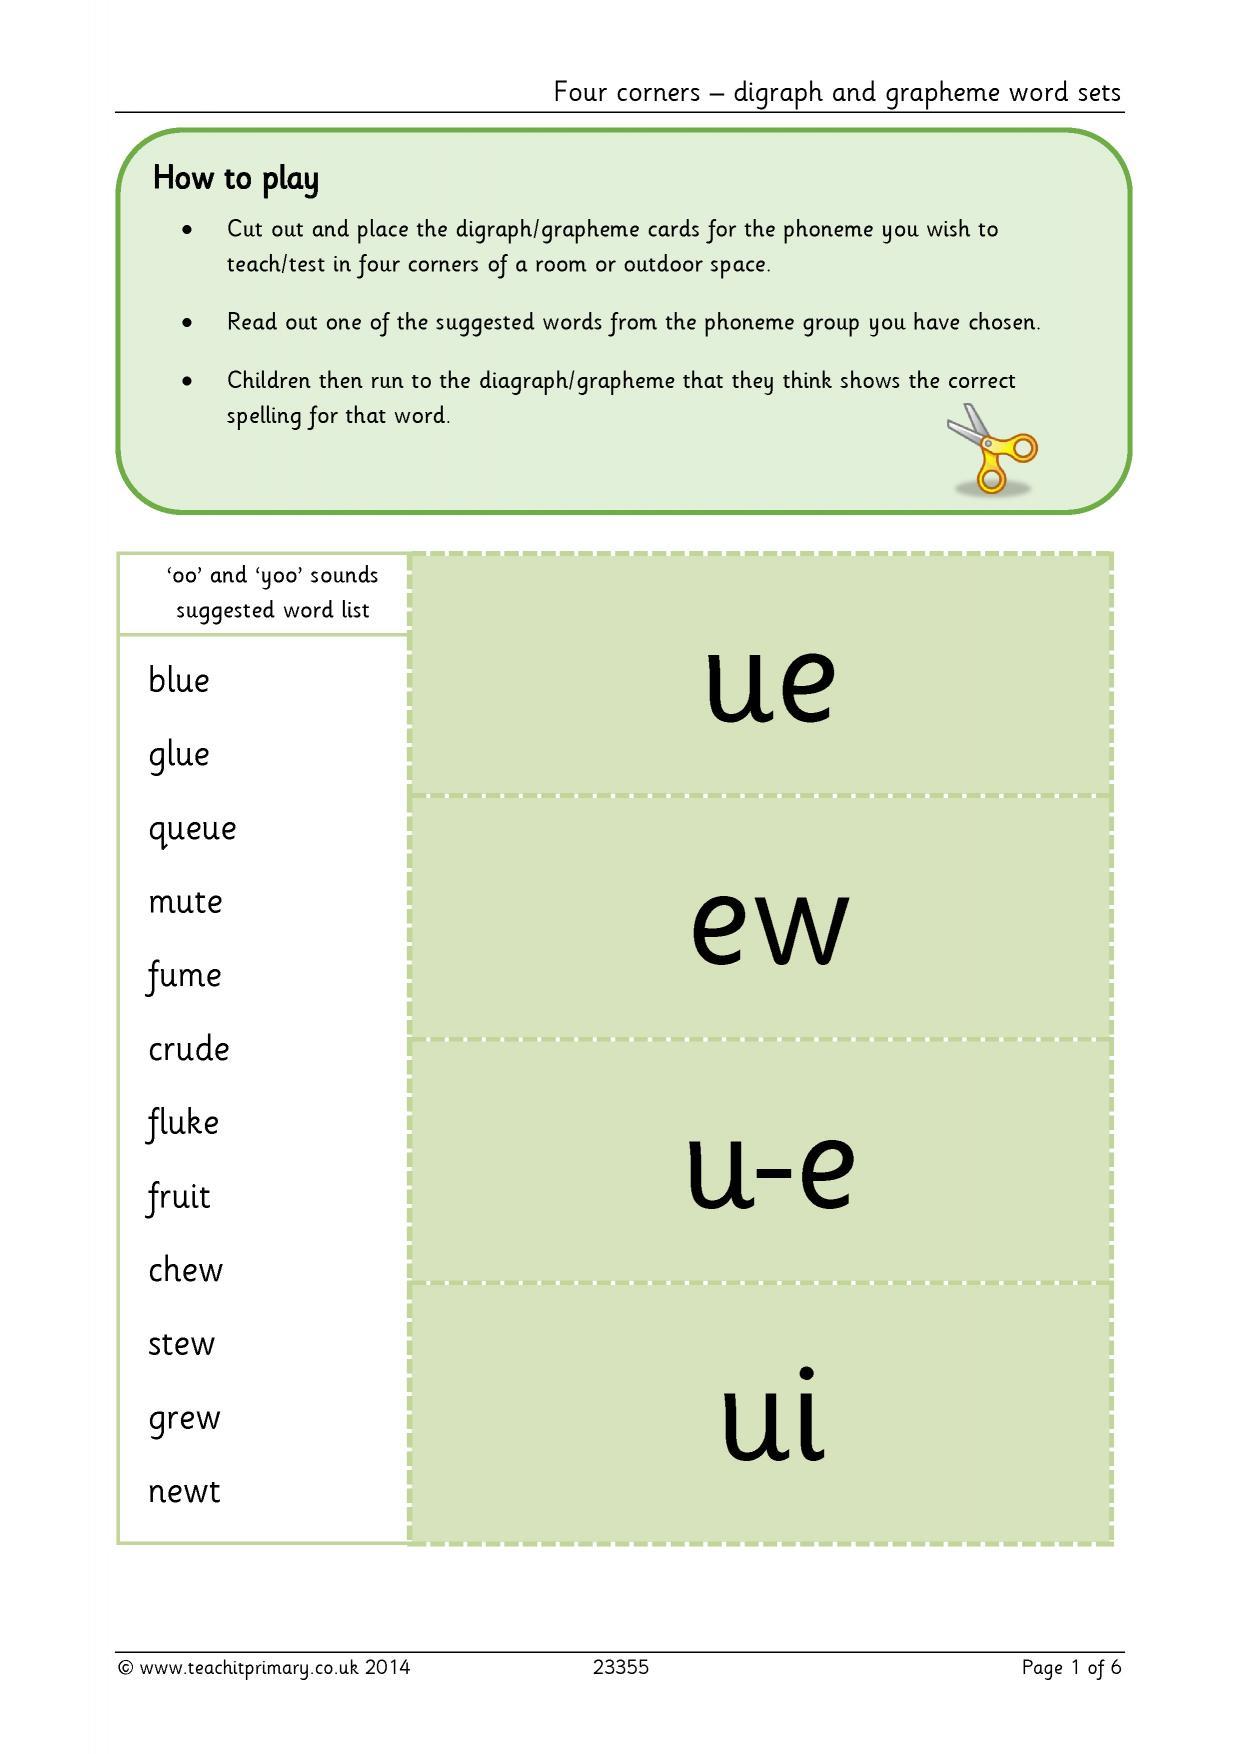 Four Corners Digraph And Grapheme Word Sets